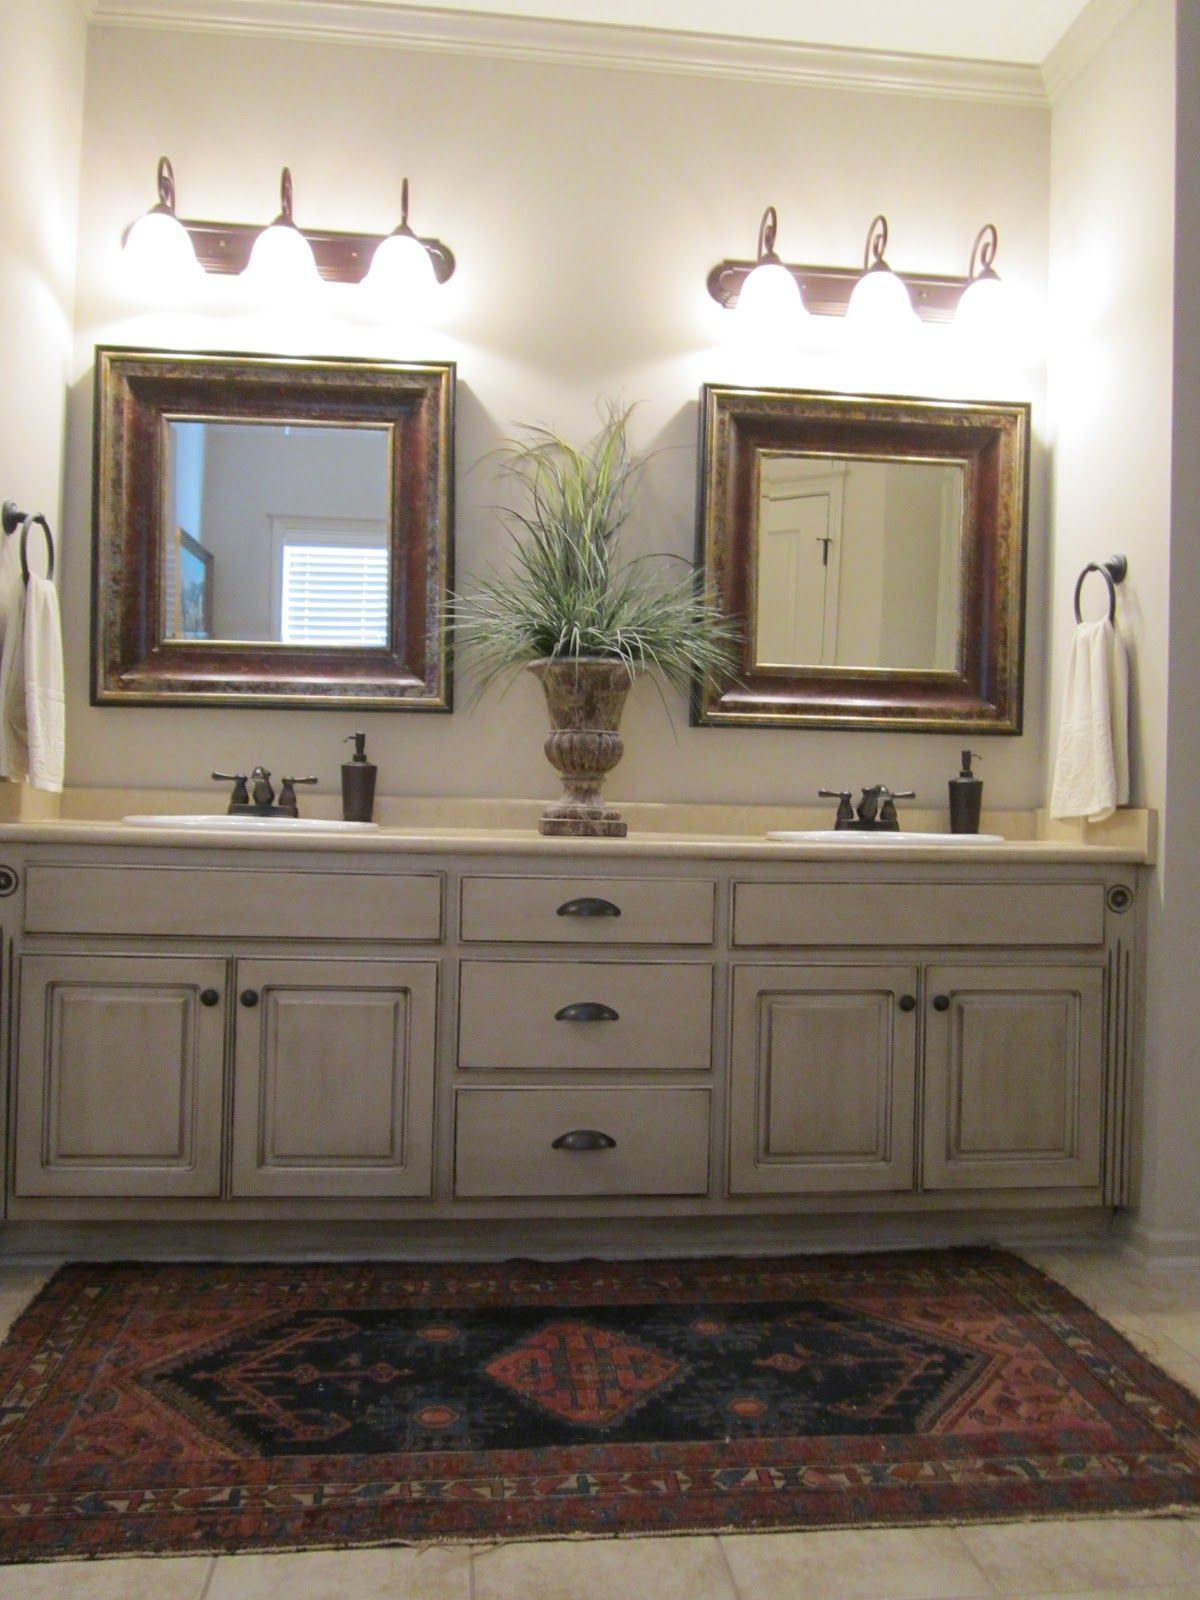 Double Bathroom Vanity Designs Ideas Have You Thought About A Double Sink Bathroom Vanity Right H Painting Bathroom Cabinets Painted Bathroom Bathroom Decor [ 1600 x 1200 Pixel ]